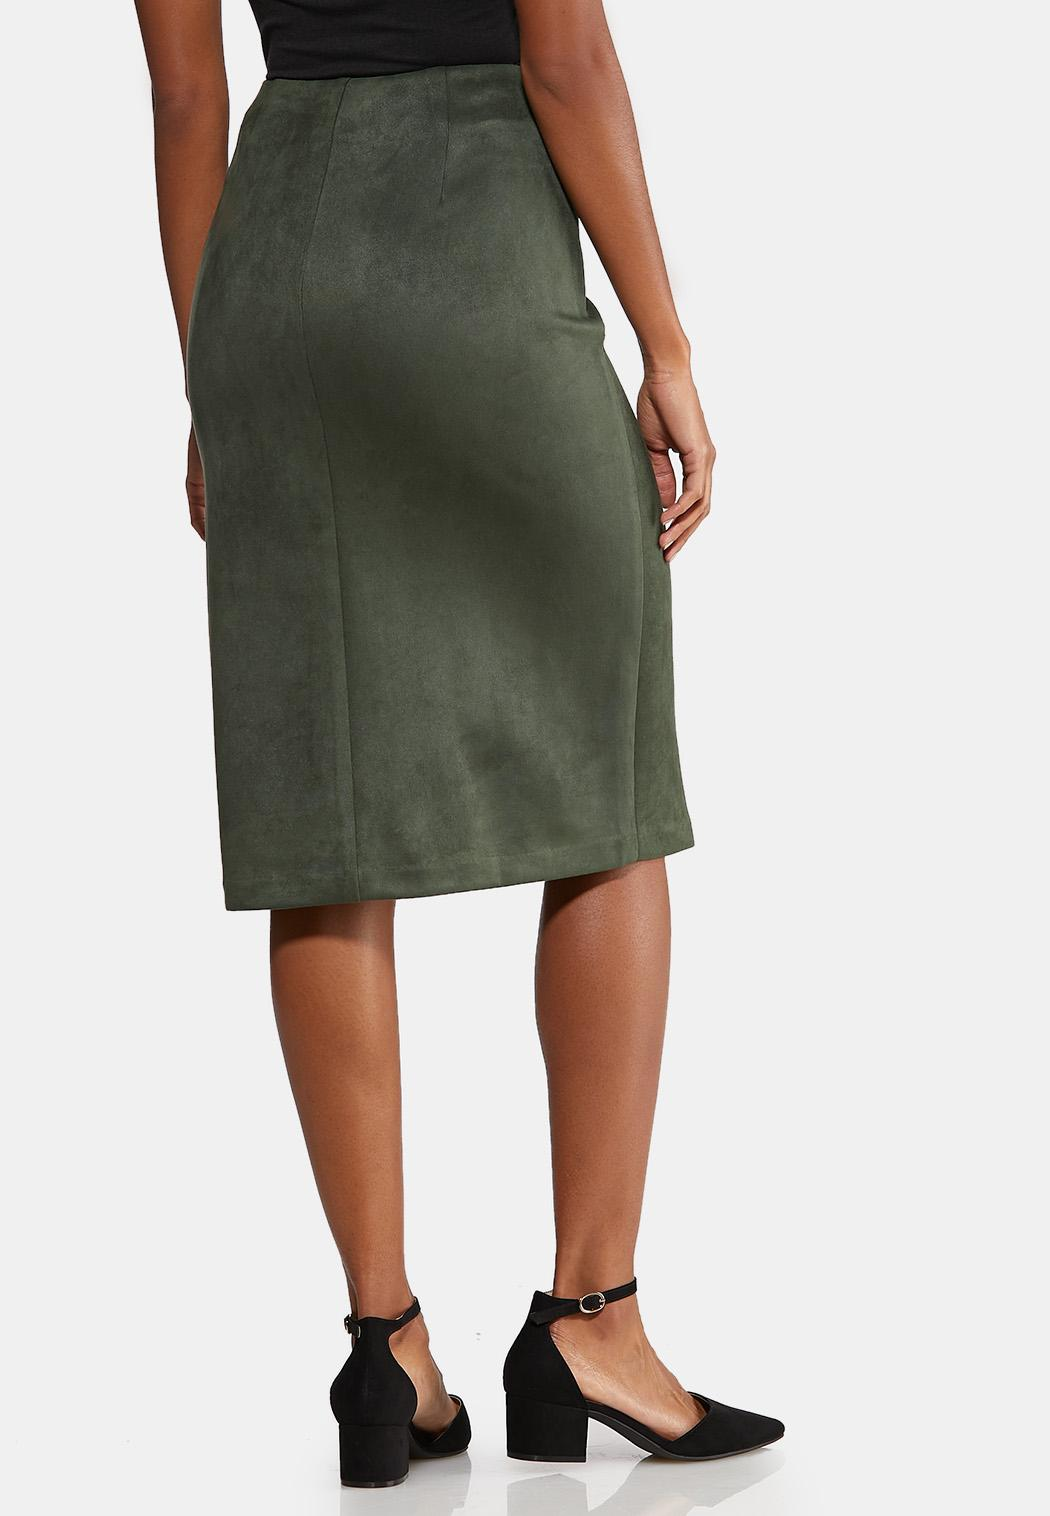 Faux Suede Tie Skirt (Item #43995885)